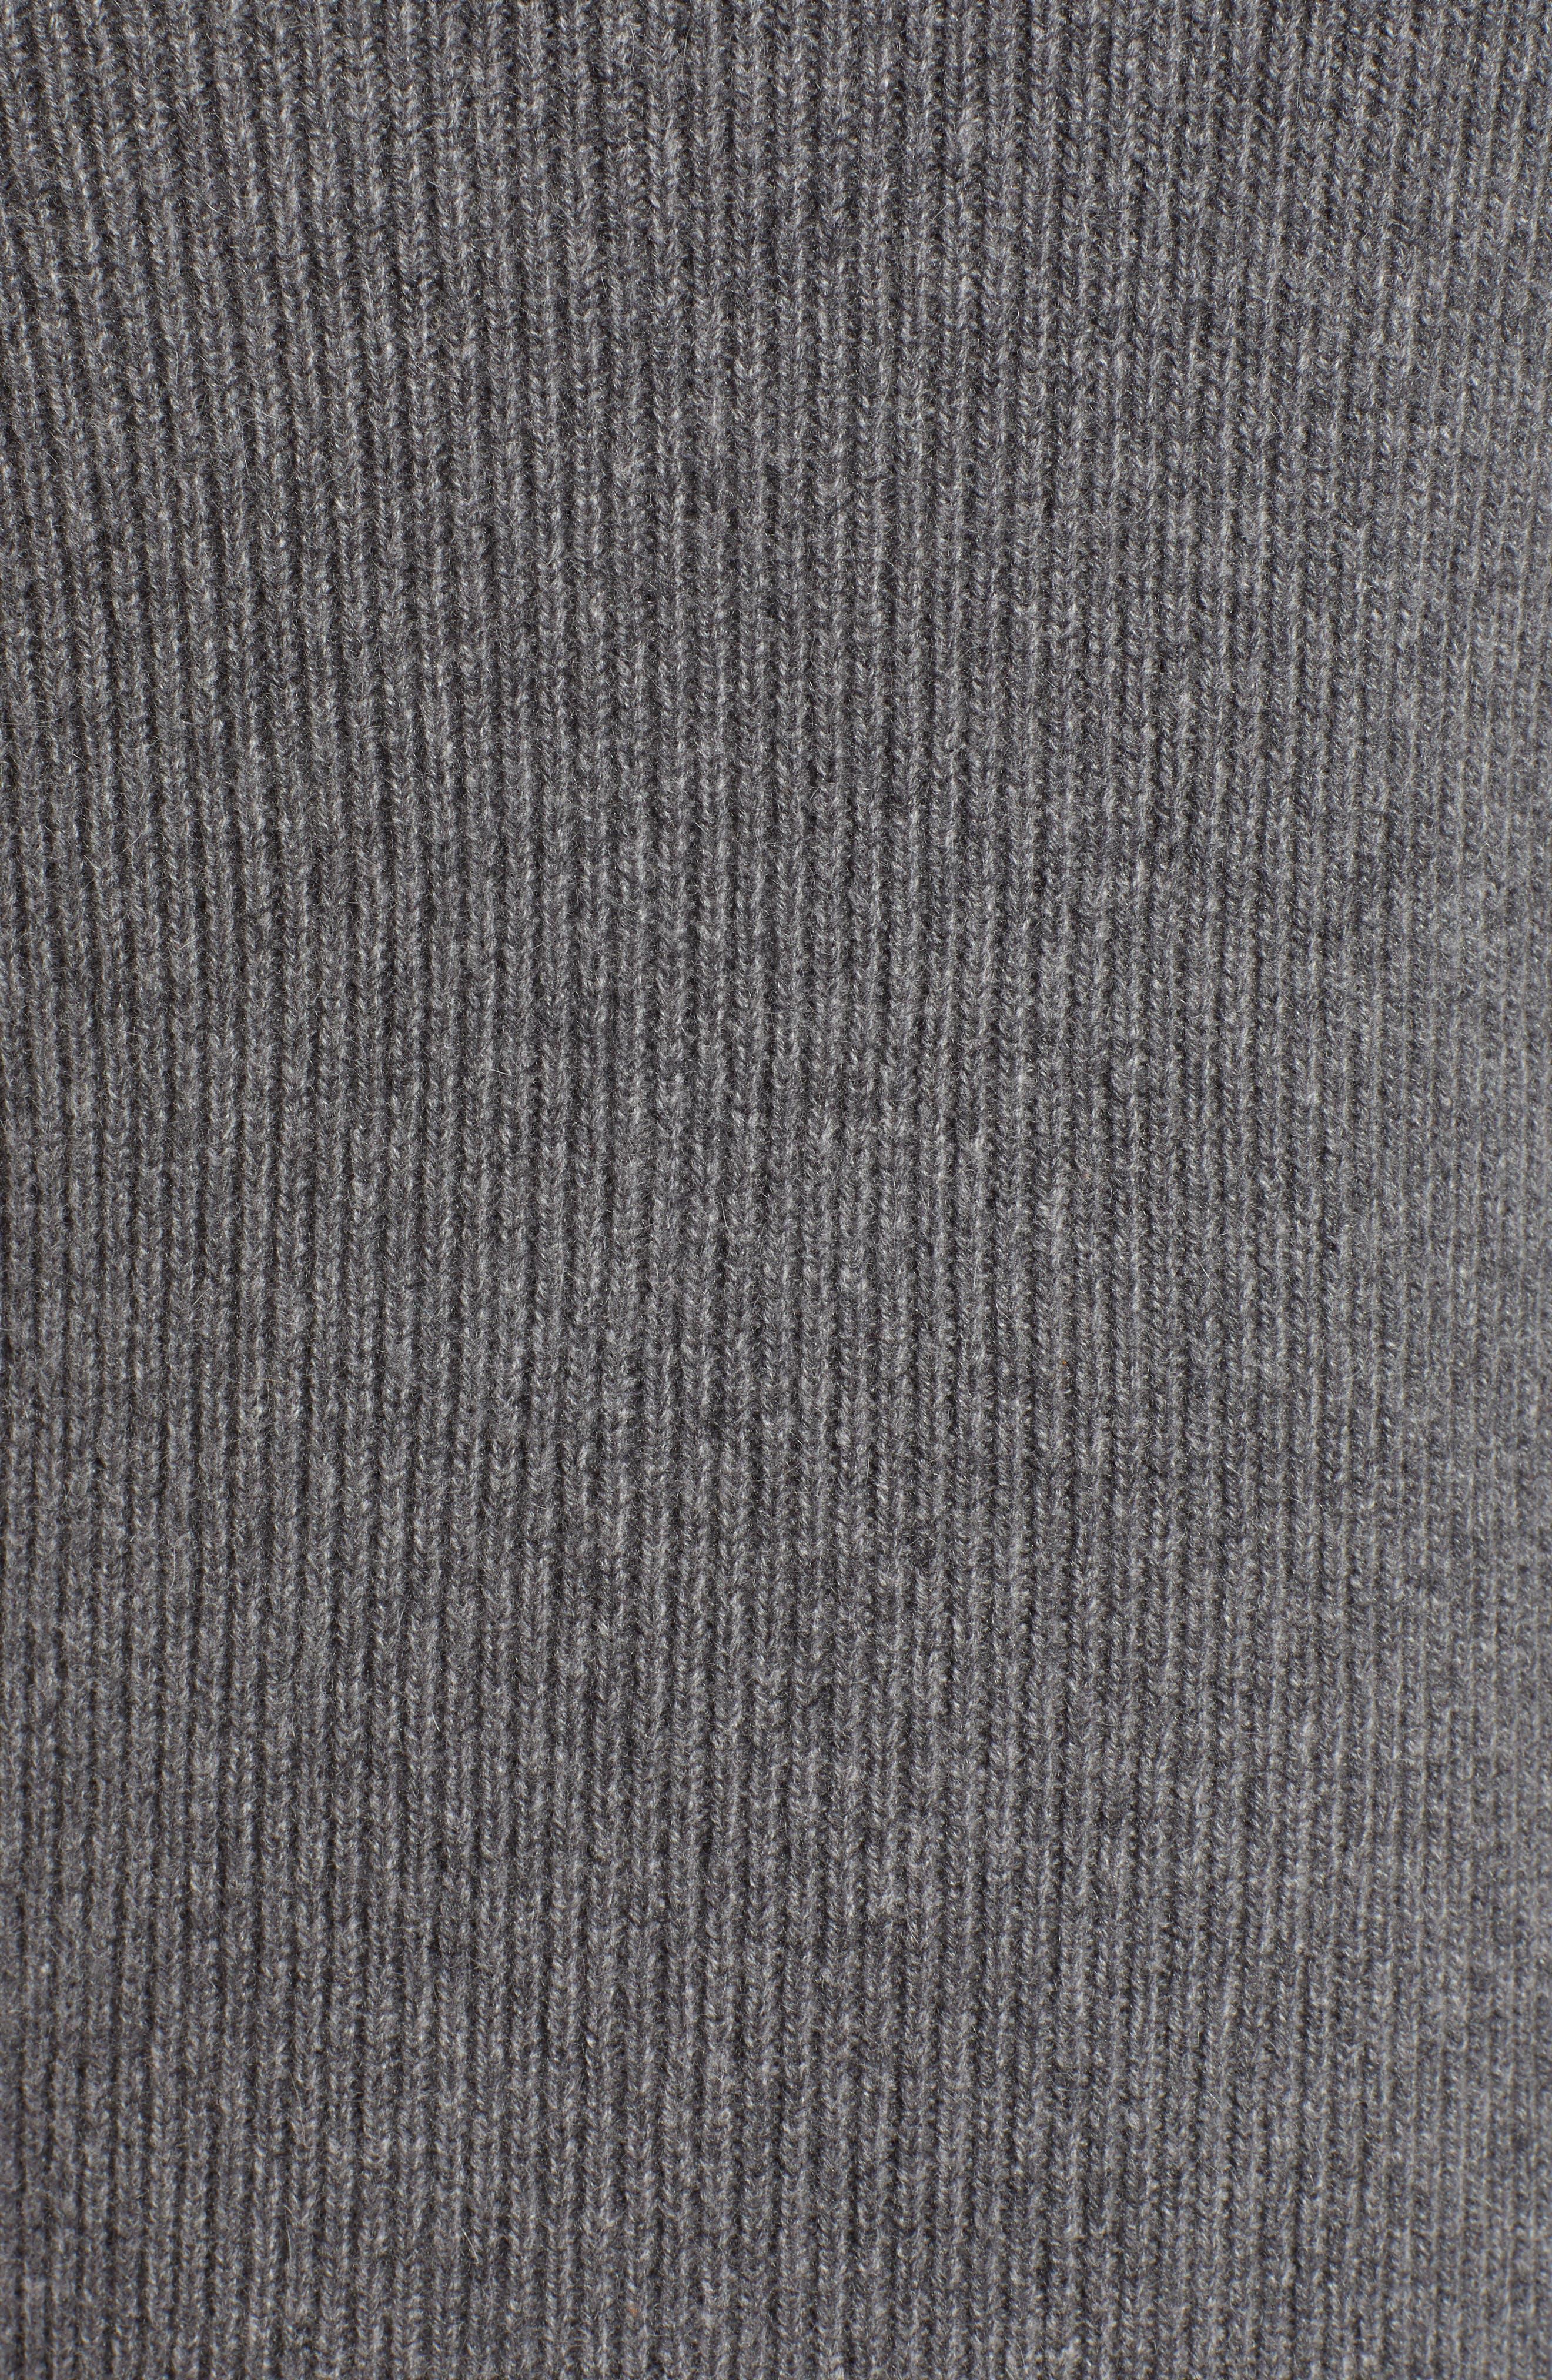 Blouson Sleeve Long Cashmere Cardigan,                             Alternate thumbnail 5, color,                             032